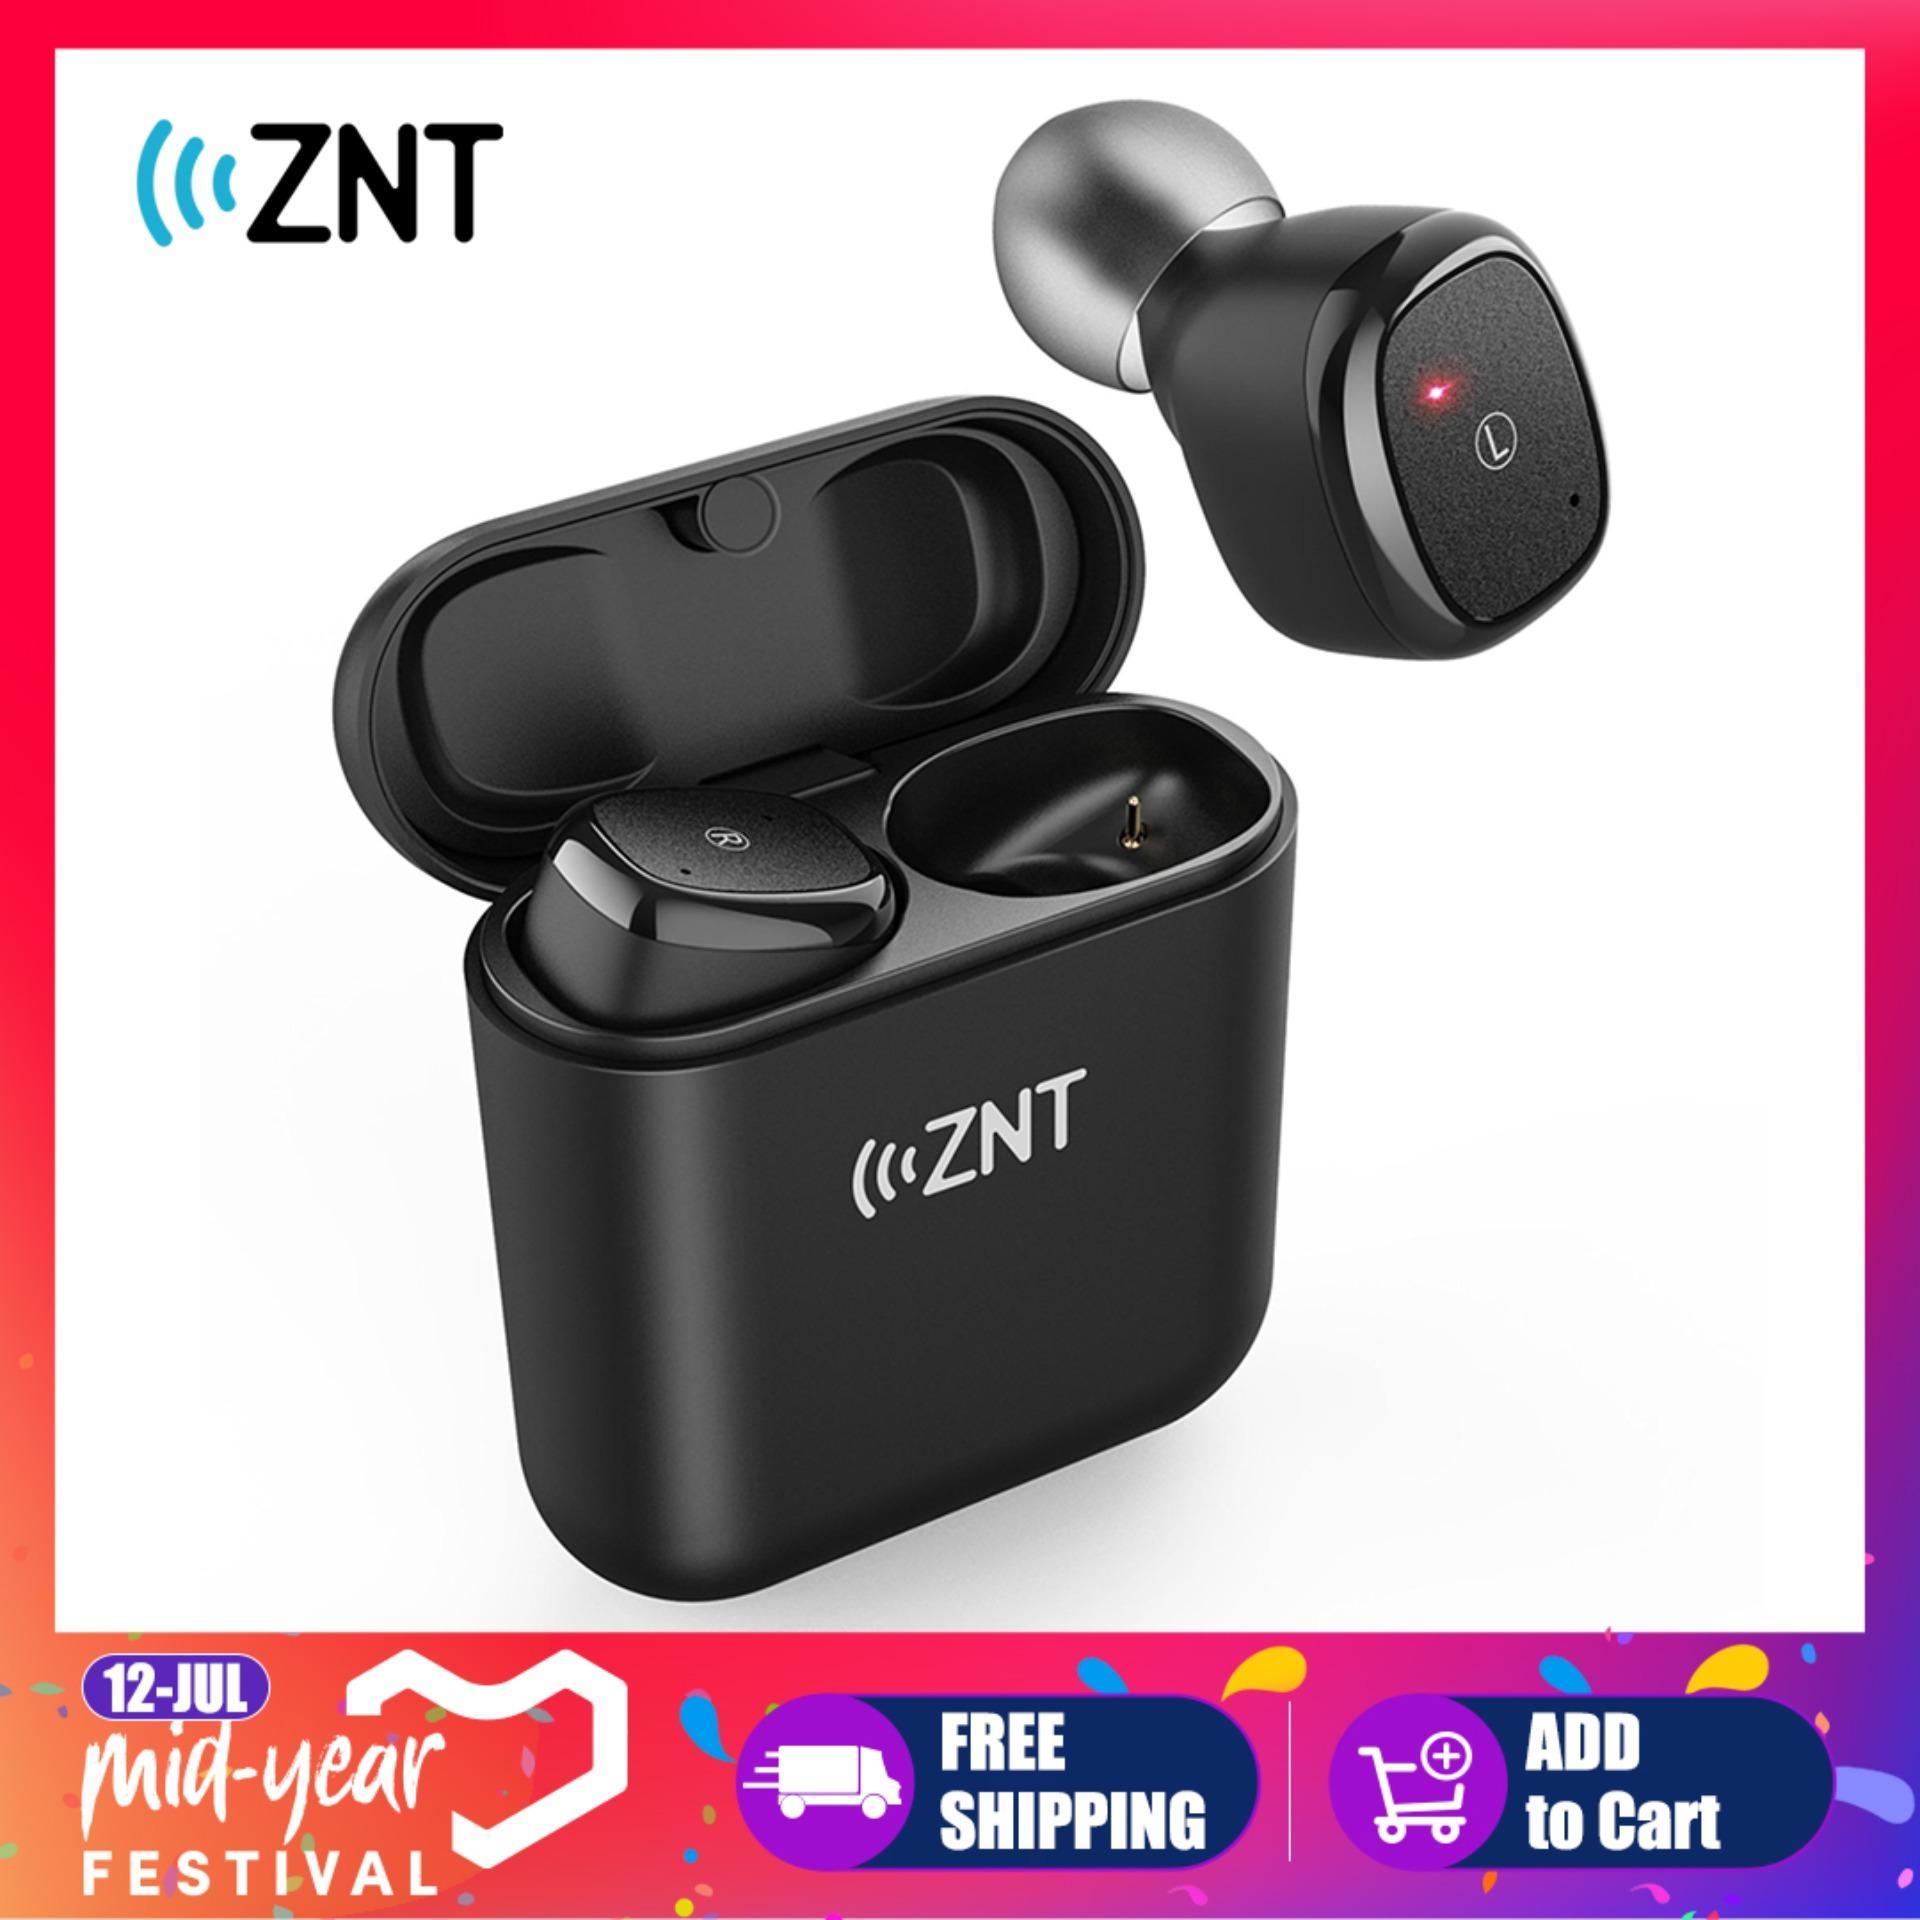 e6f8a3f07cb ZNT D06-L True Wireless Earbuds with Bluetooth 5.0 and Hi-Fi Sound Quality